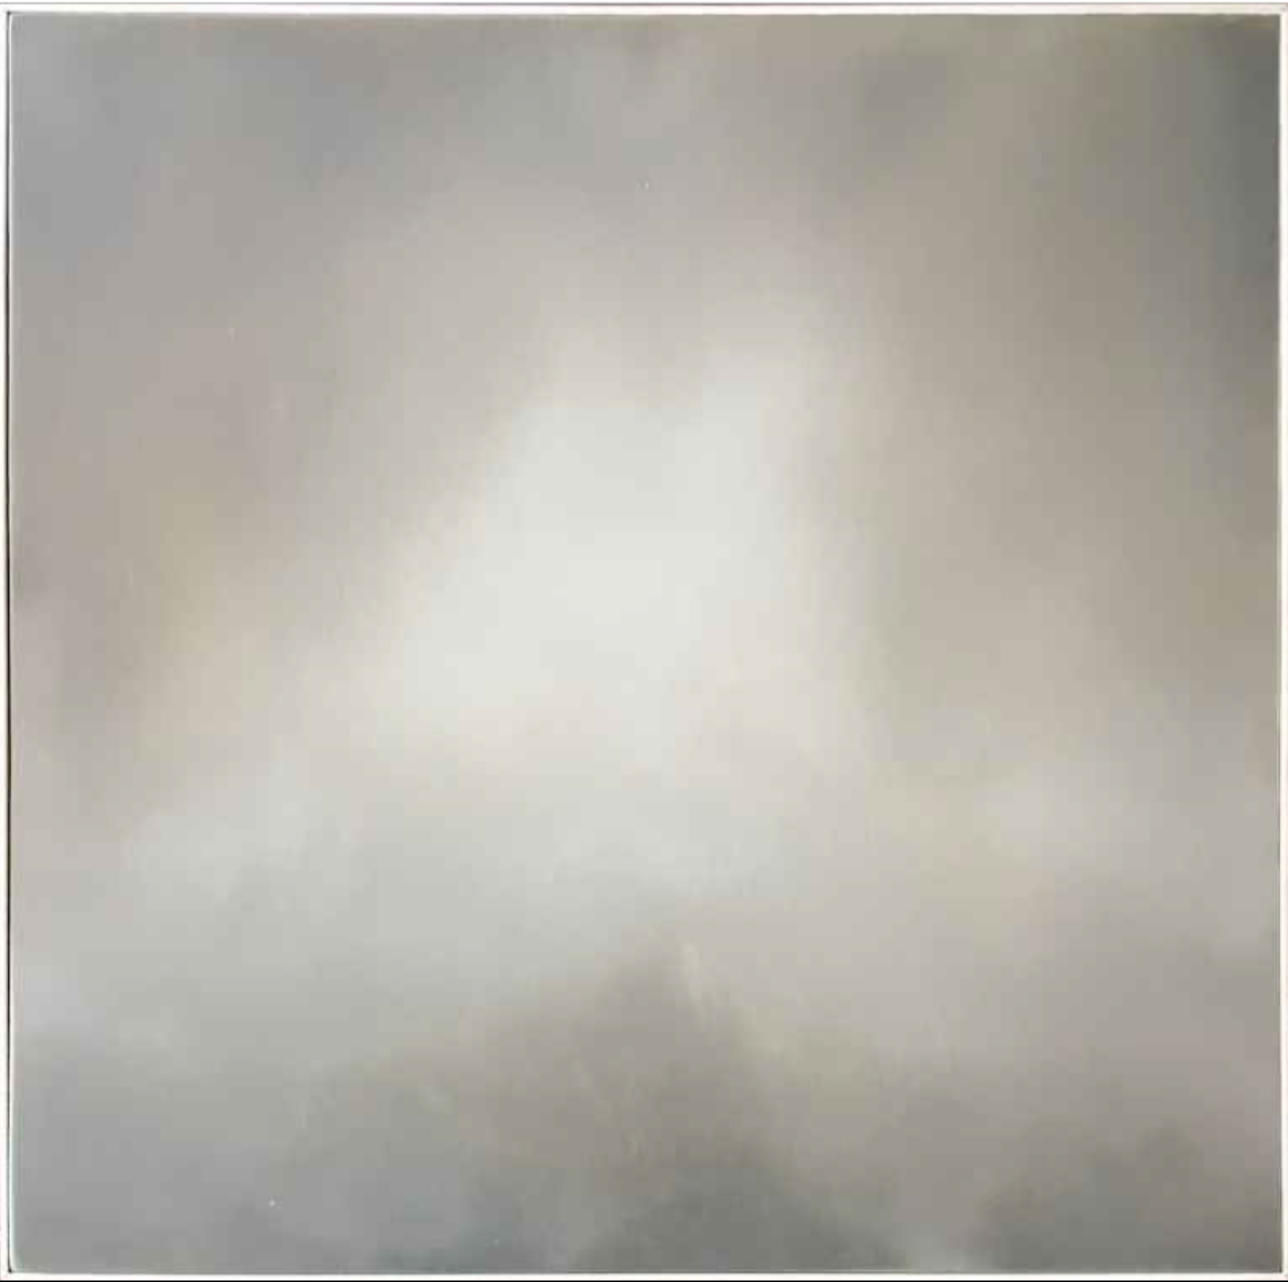 Matthew C. Metzger, Mountains in Fog III  Oil on Wood Panel, 24x24 in.